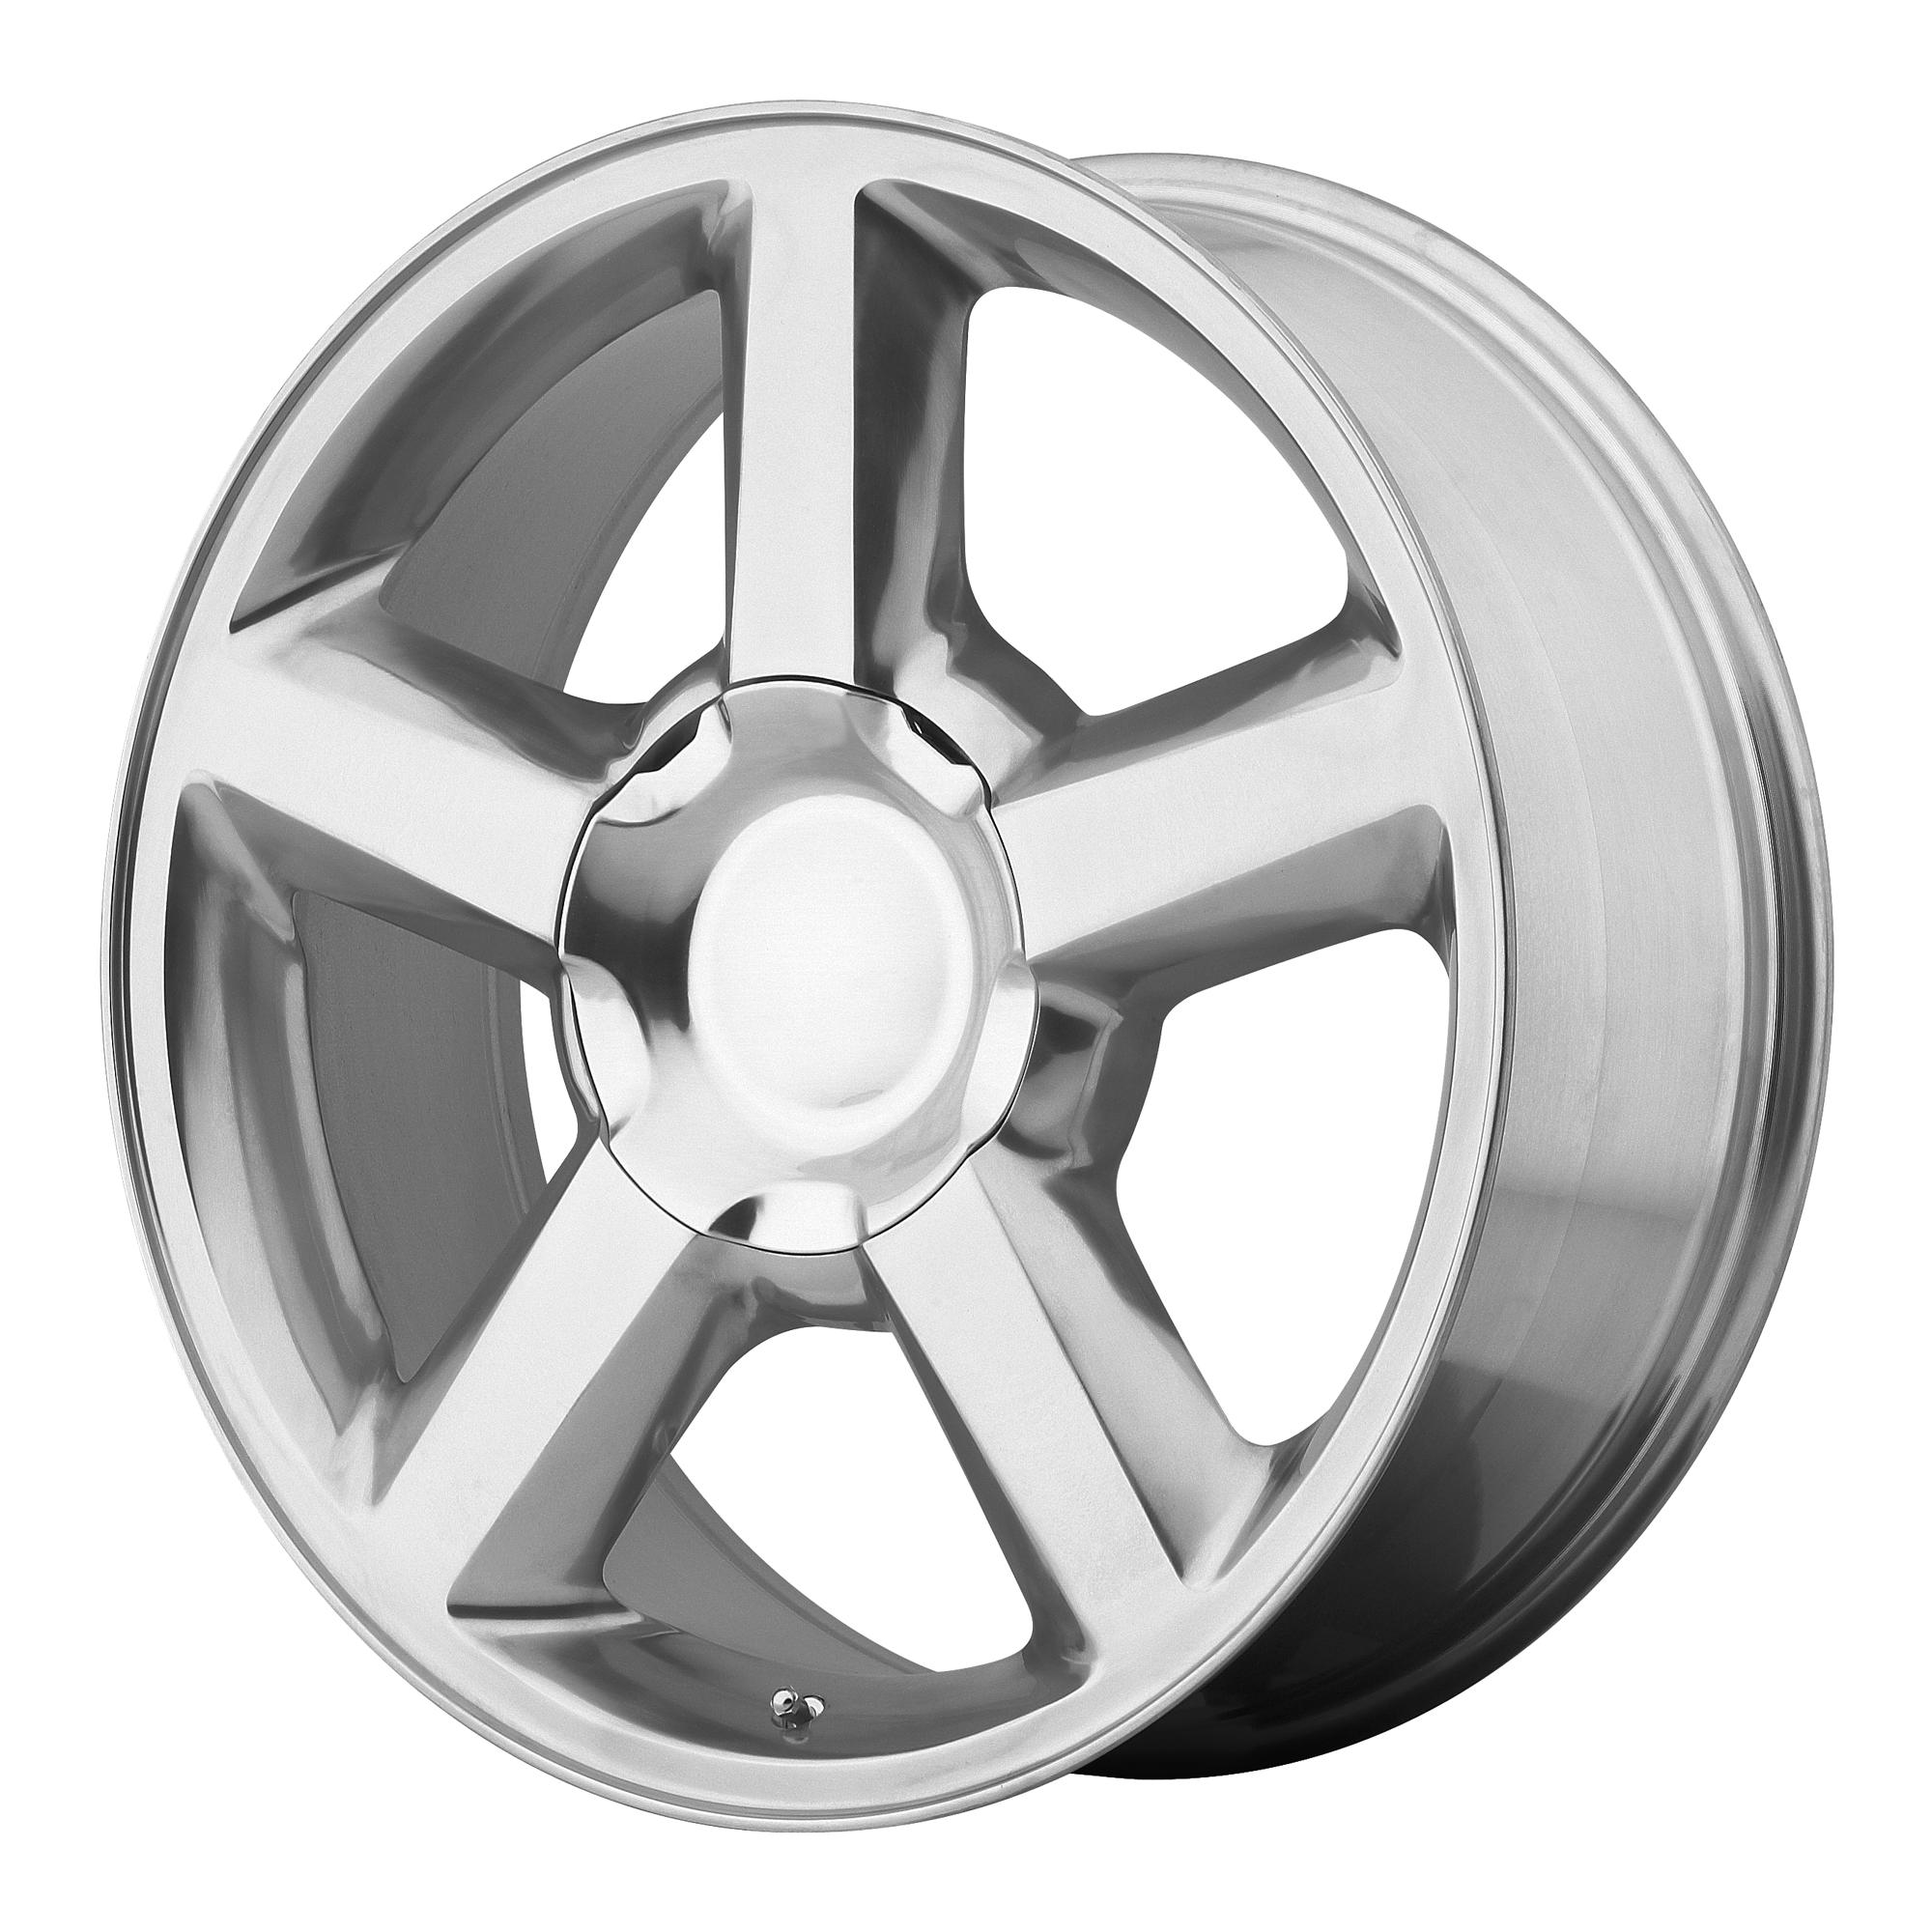 OE Creations Replica Wheels OE Creations 131C Polished w/ Clear Coat